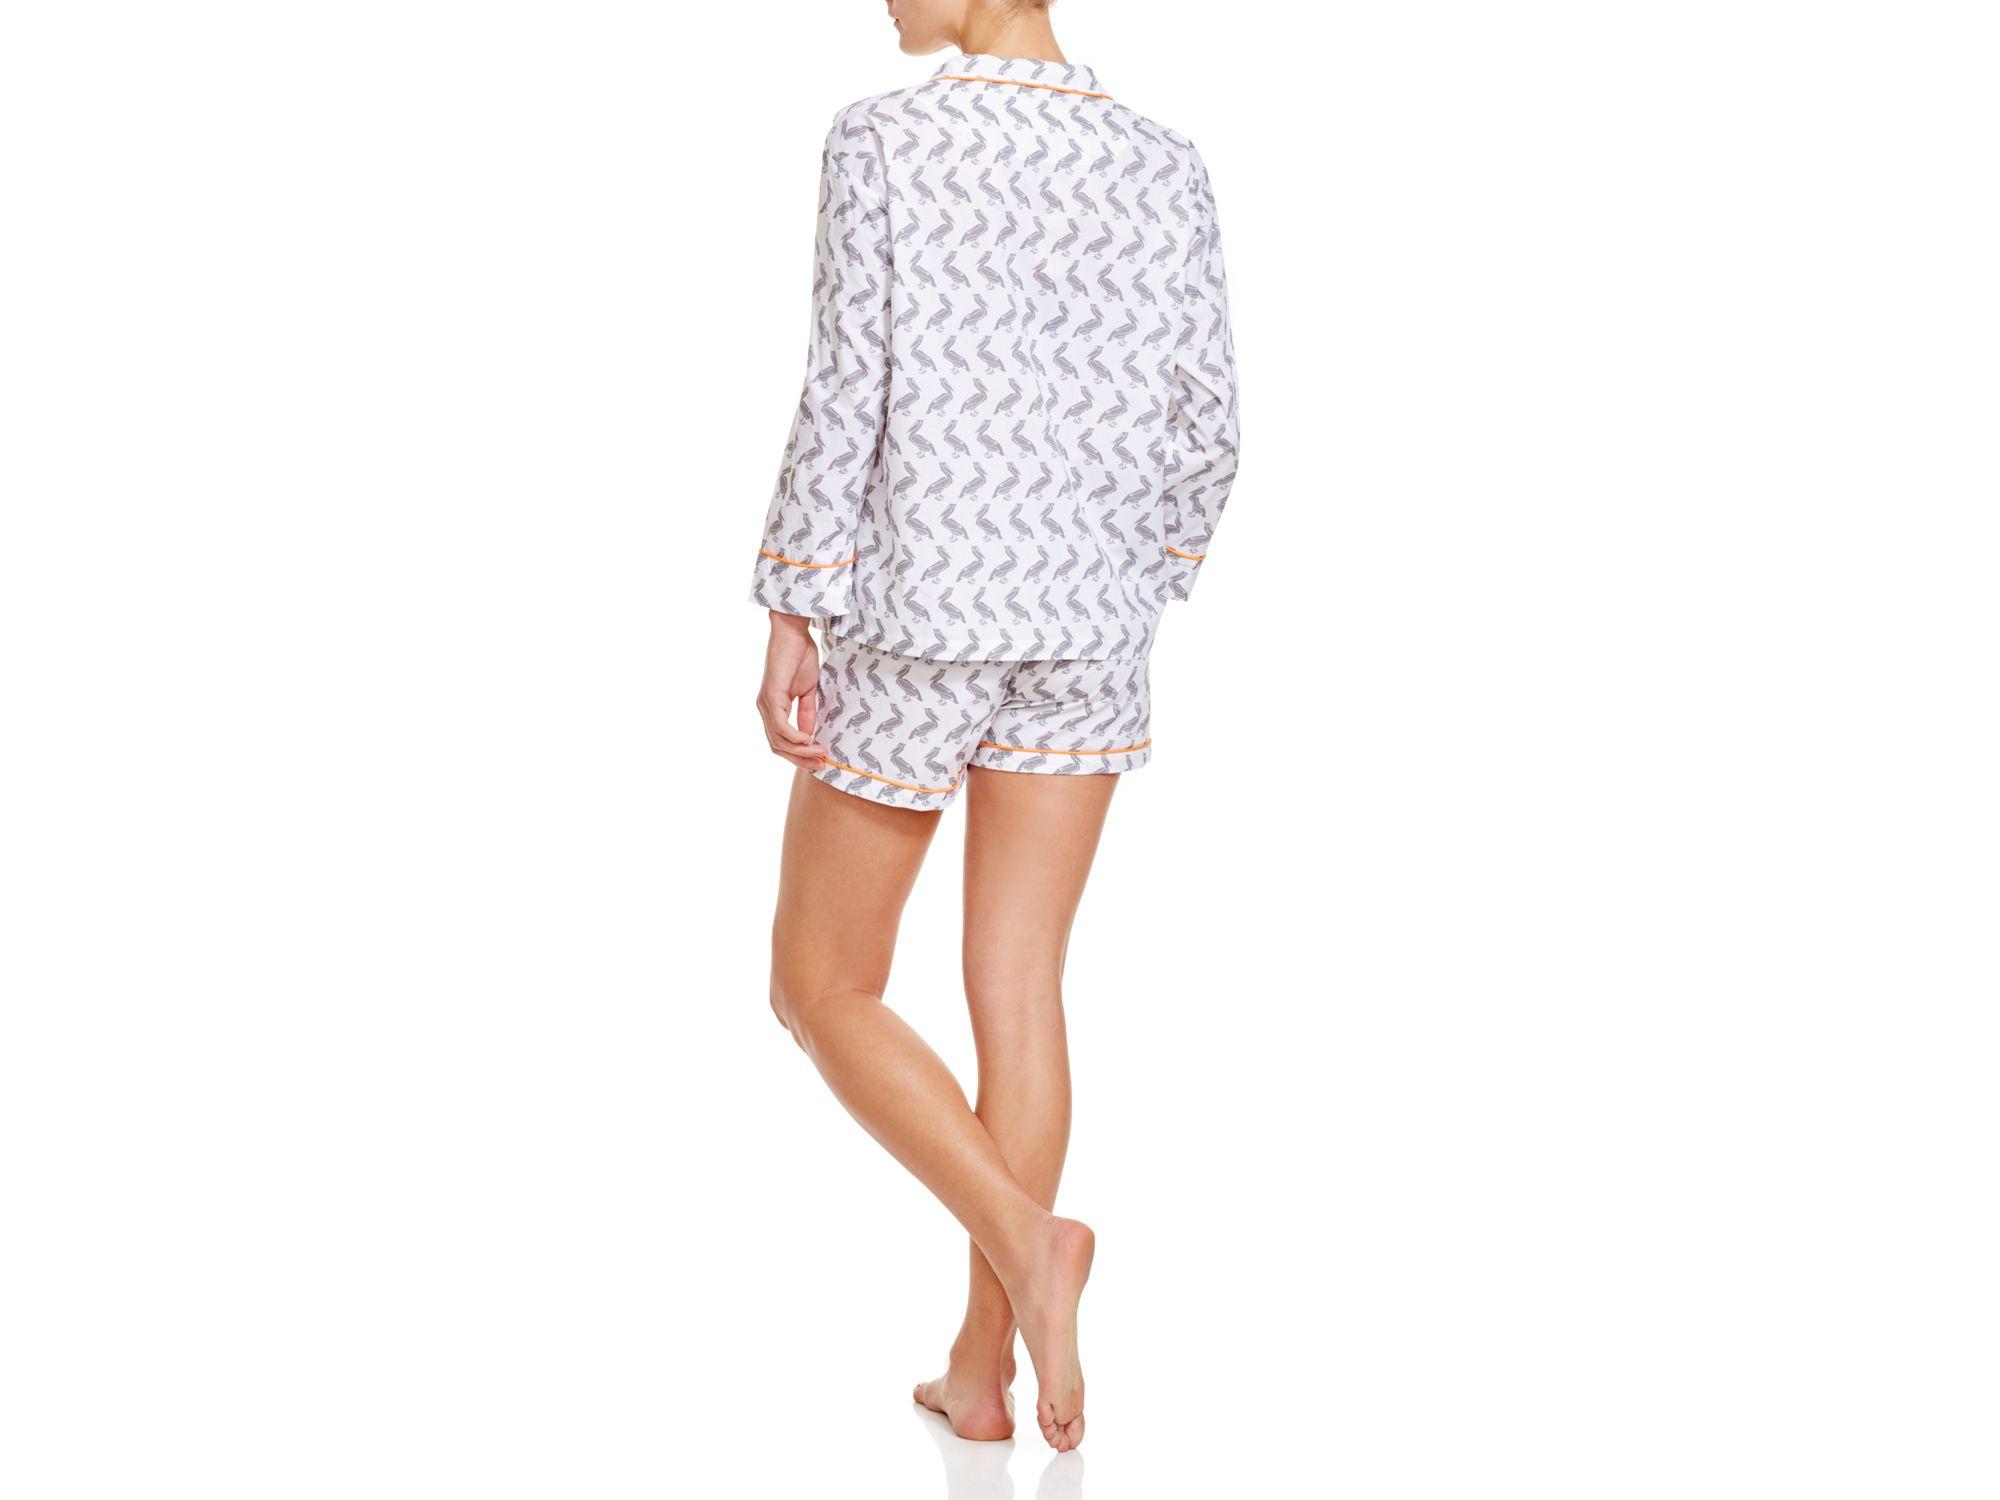 Lyst - Marigot Collection Slate Pelican Short Pajama Sets in Gray 73ec95f8b